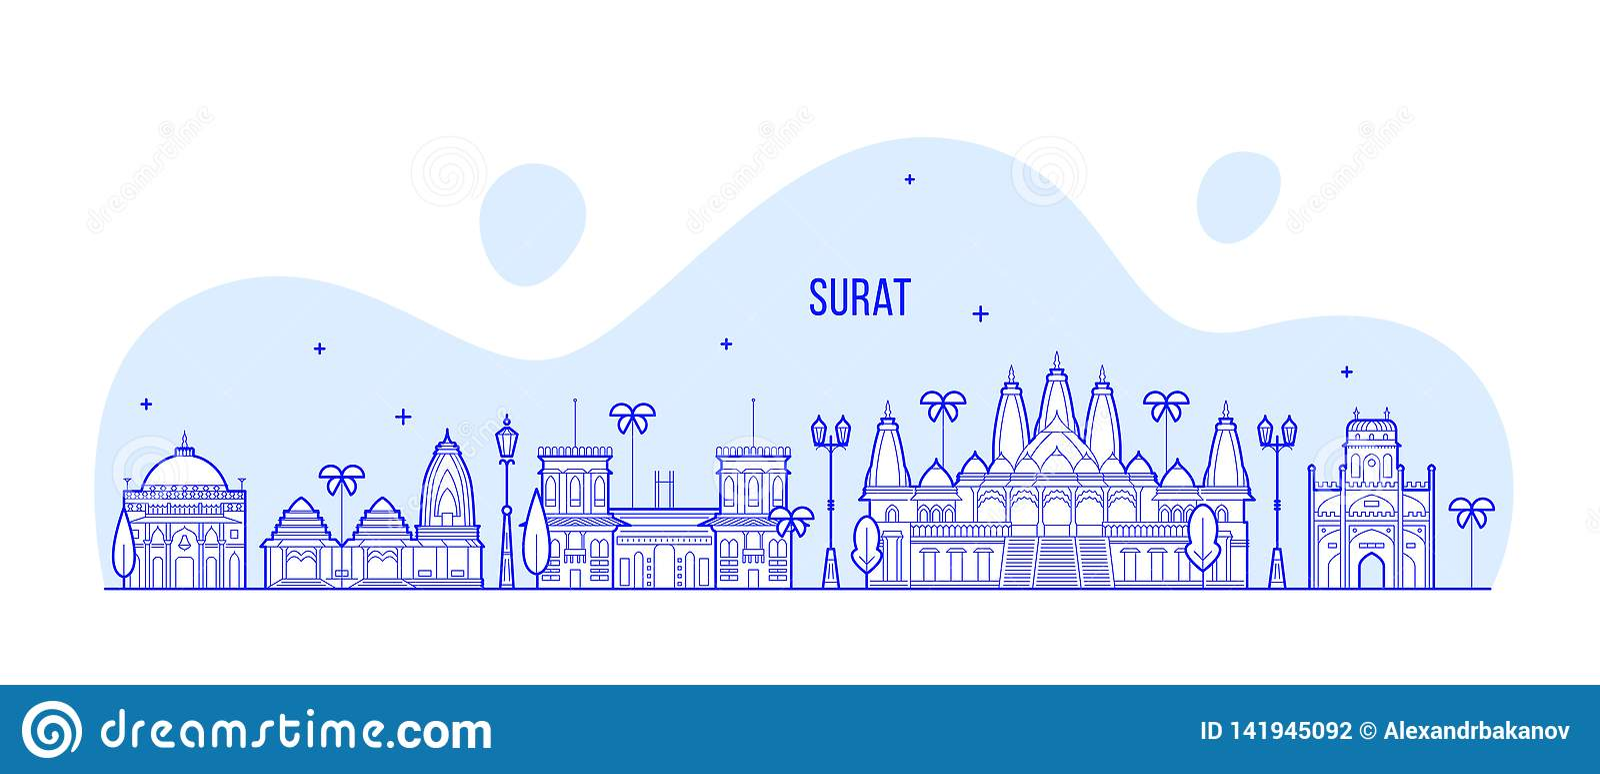 Surat Skyline Gujarat India City Buildings Vector Stock